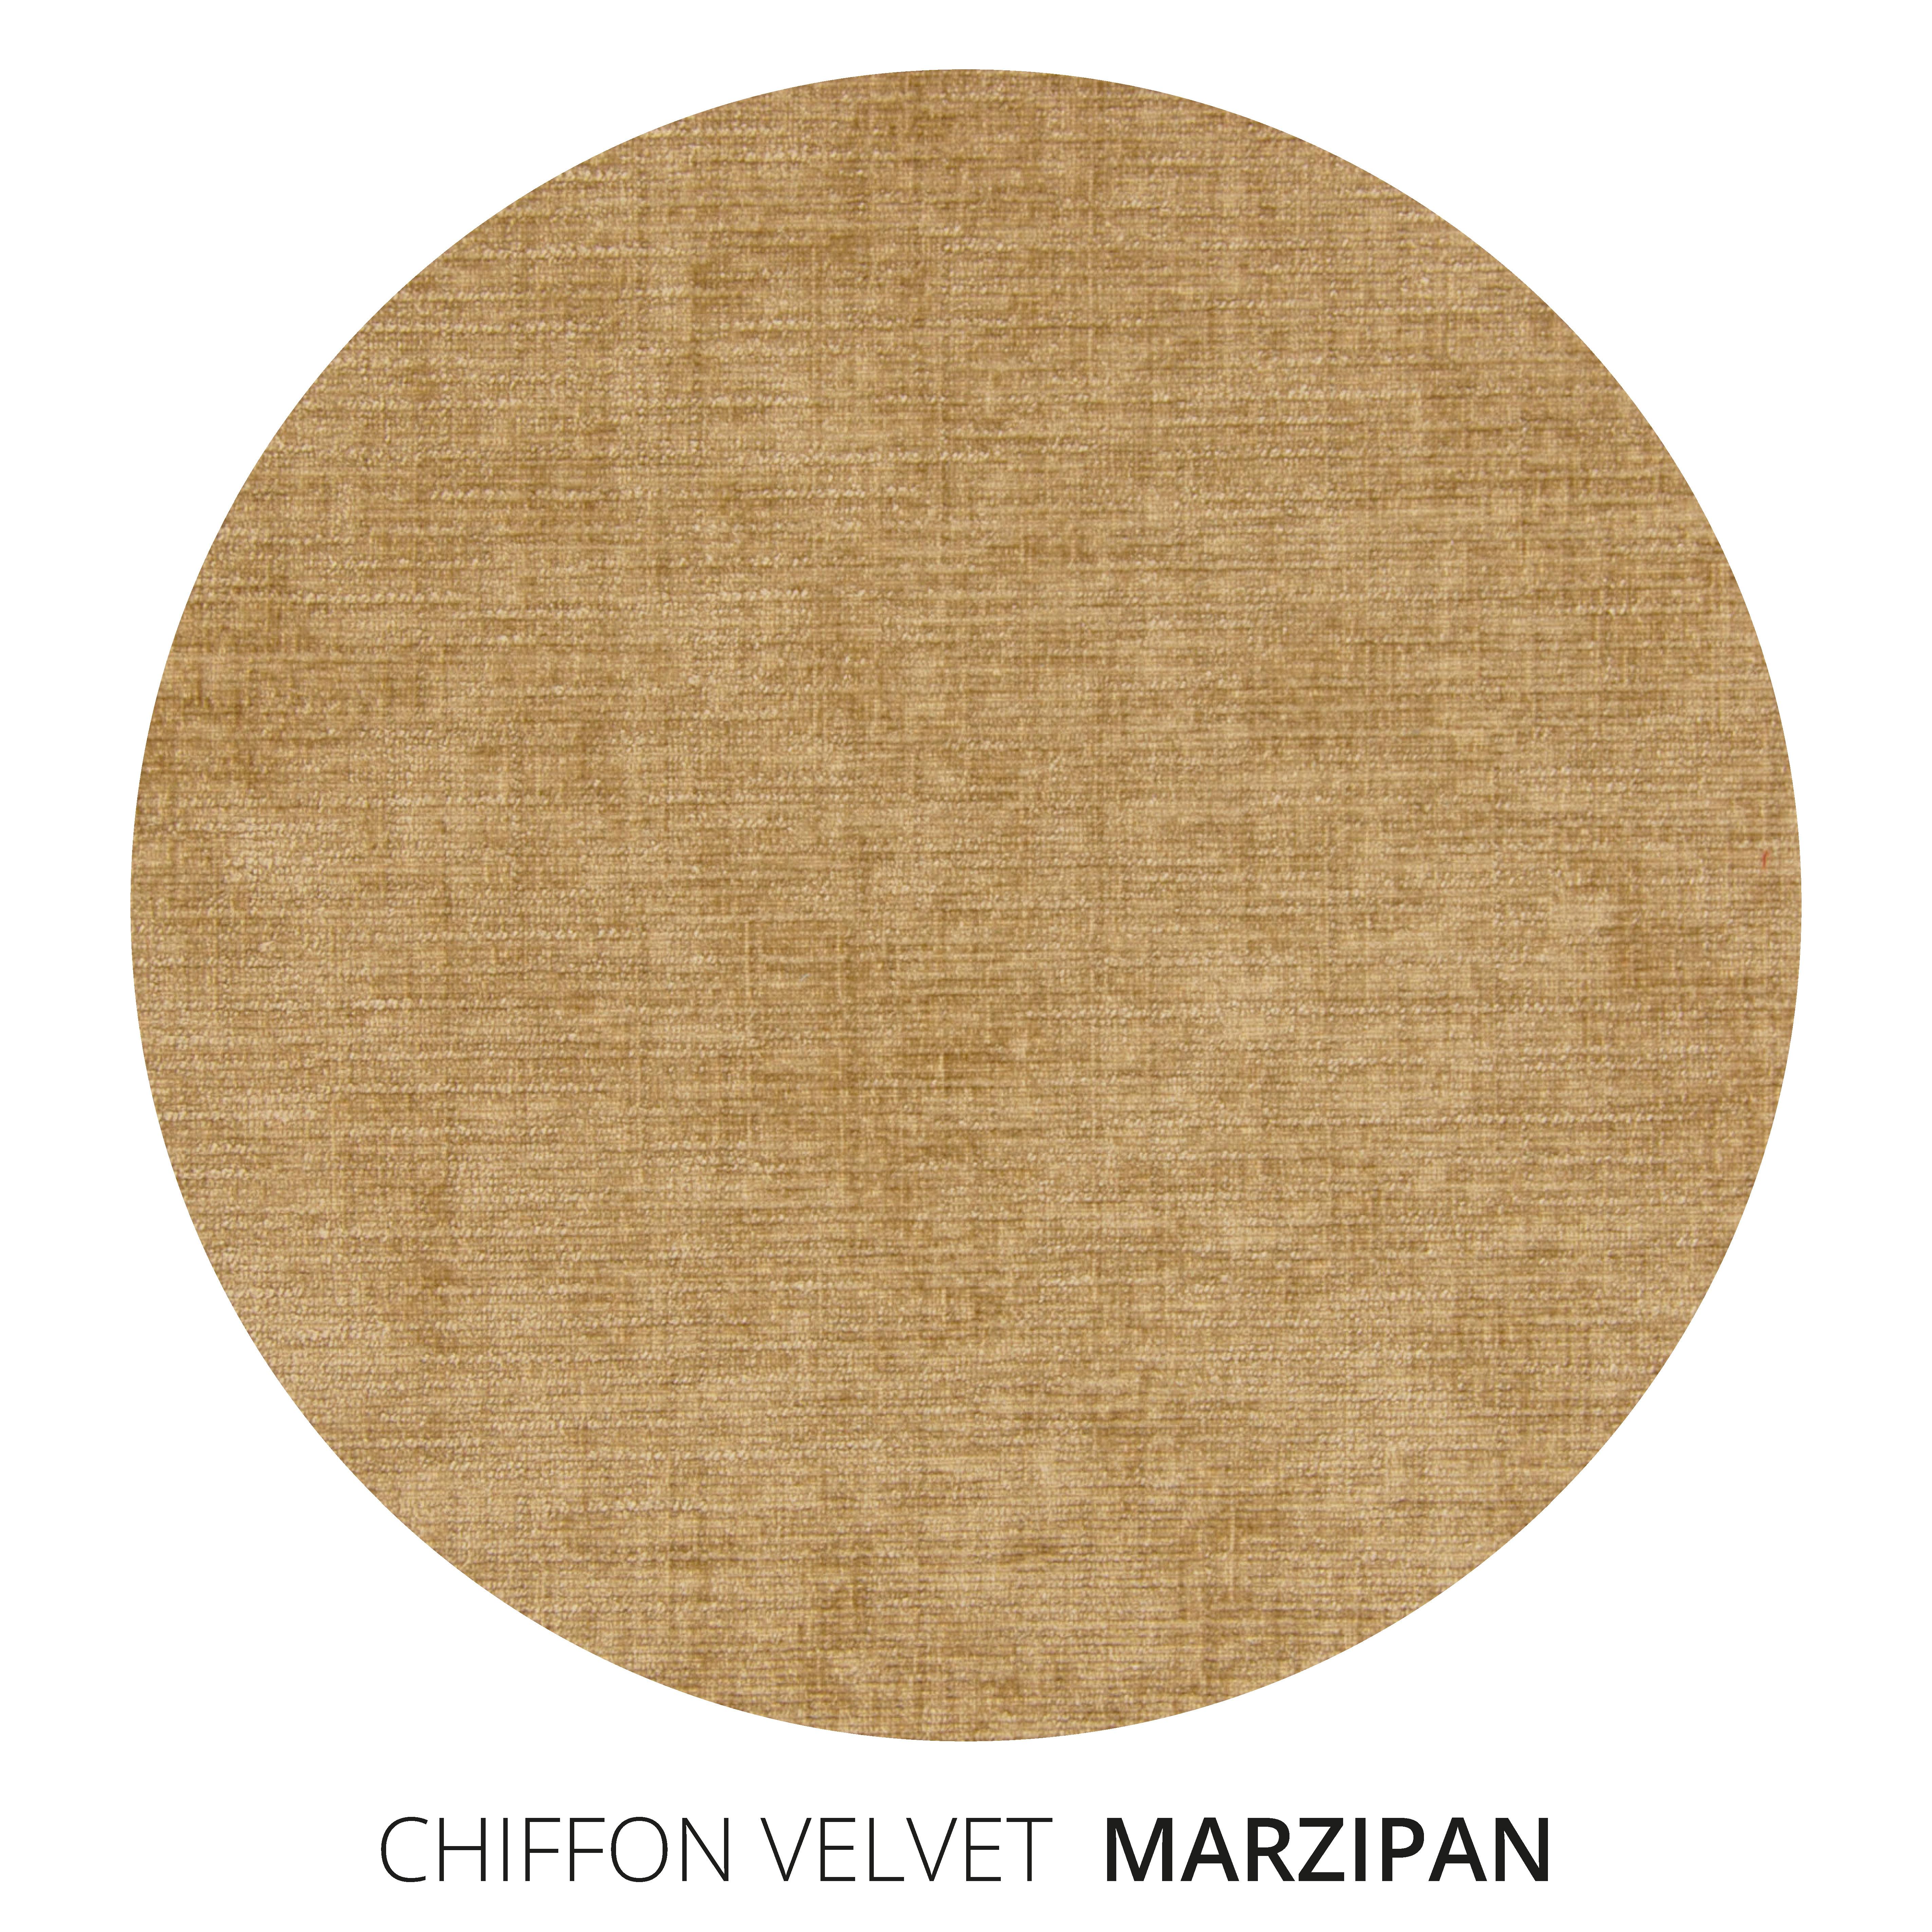 Marzipan Chiffon Velvet Swatch